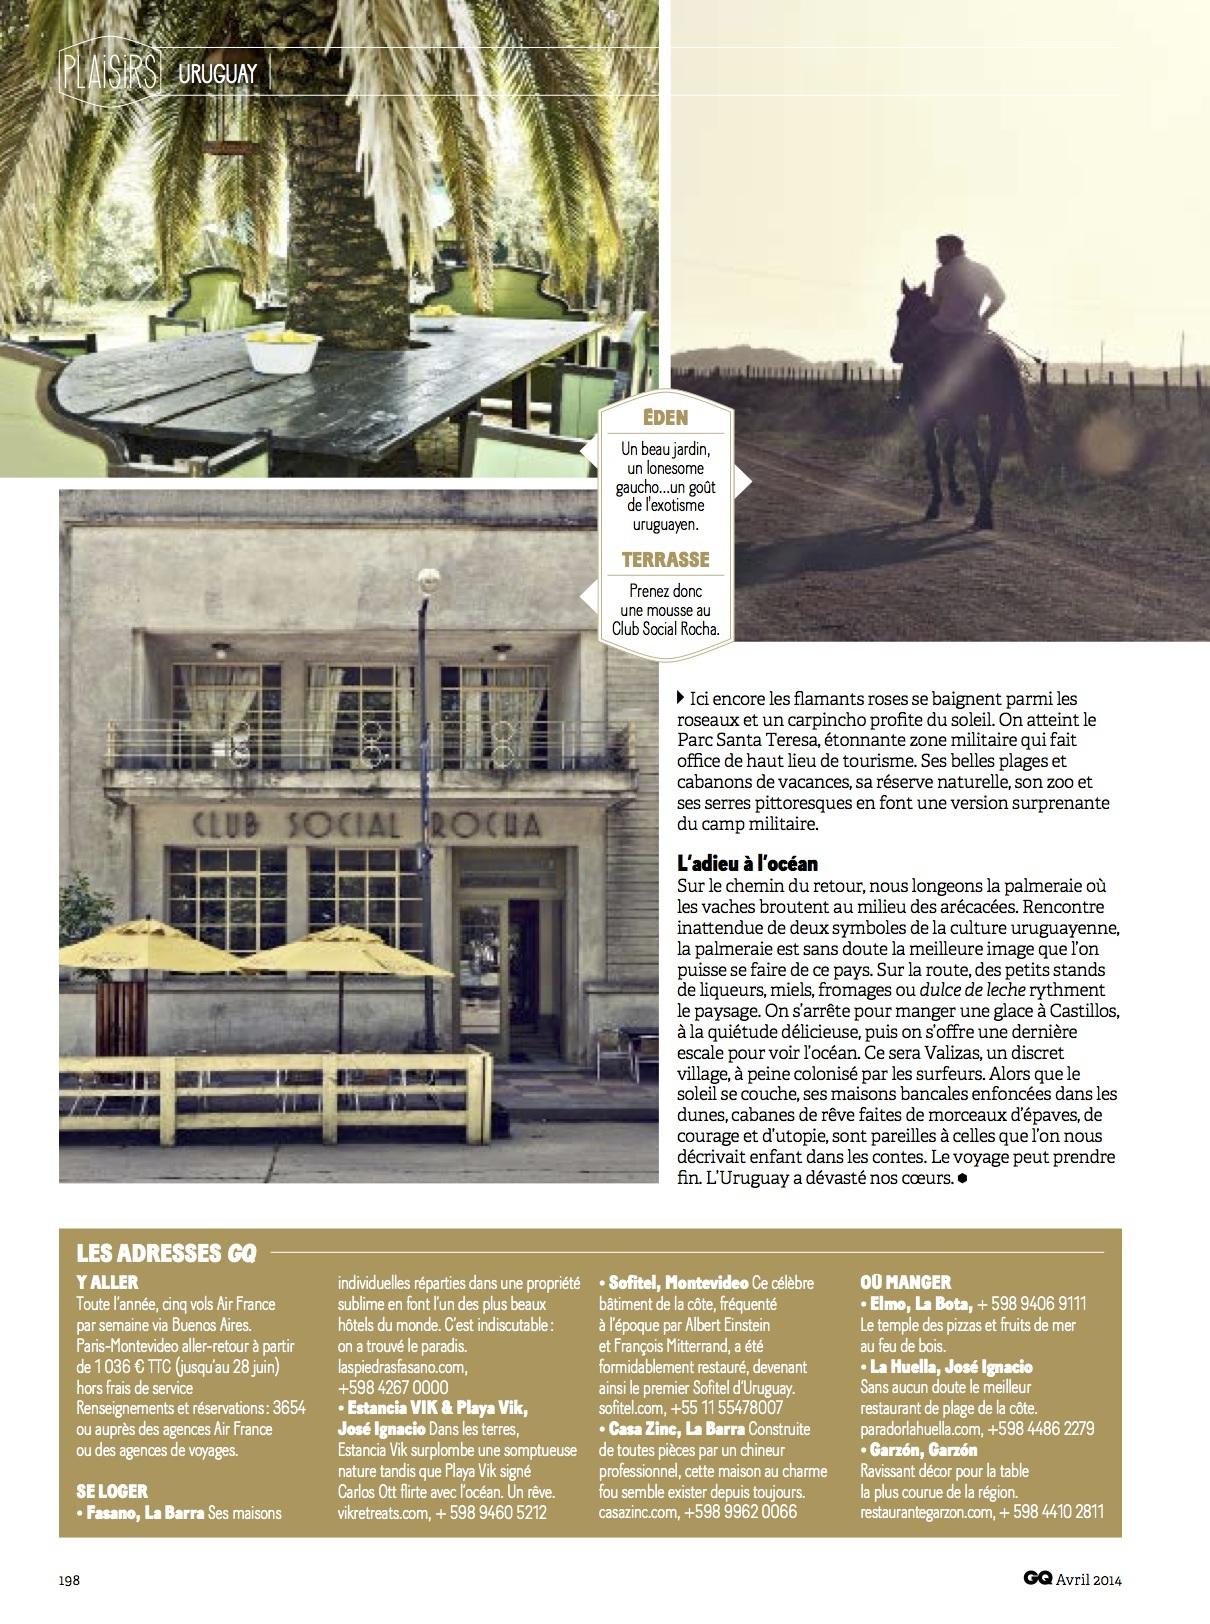 Magazines - www.laureflammarion.com